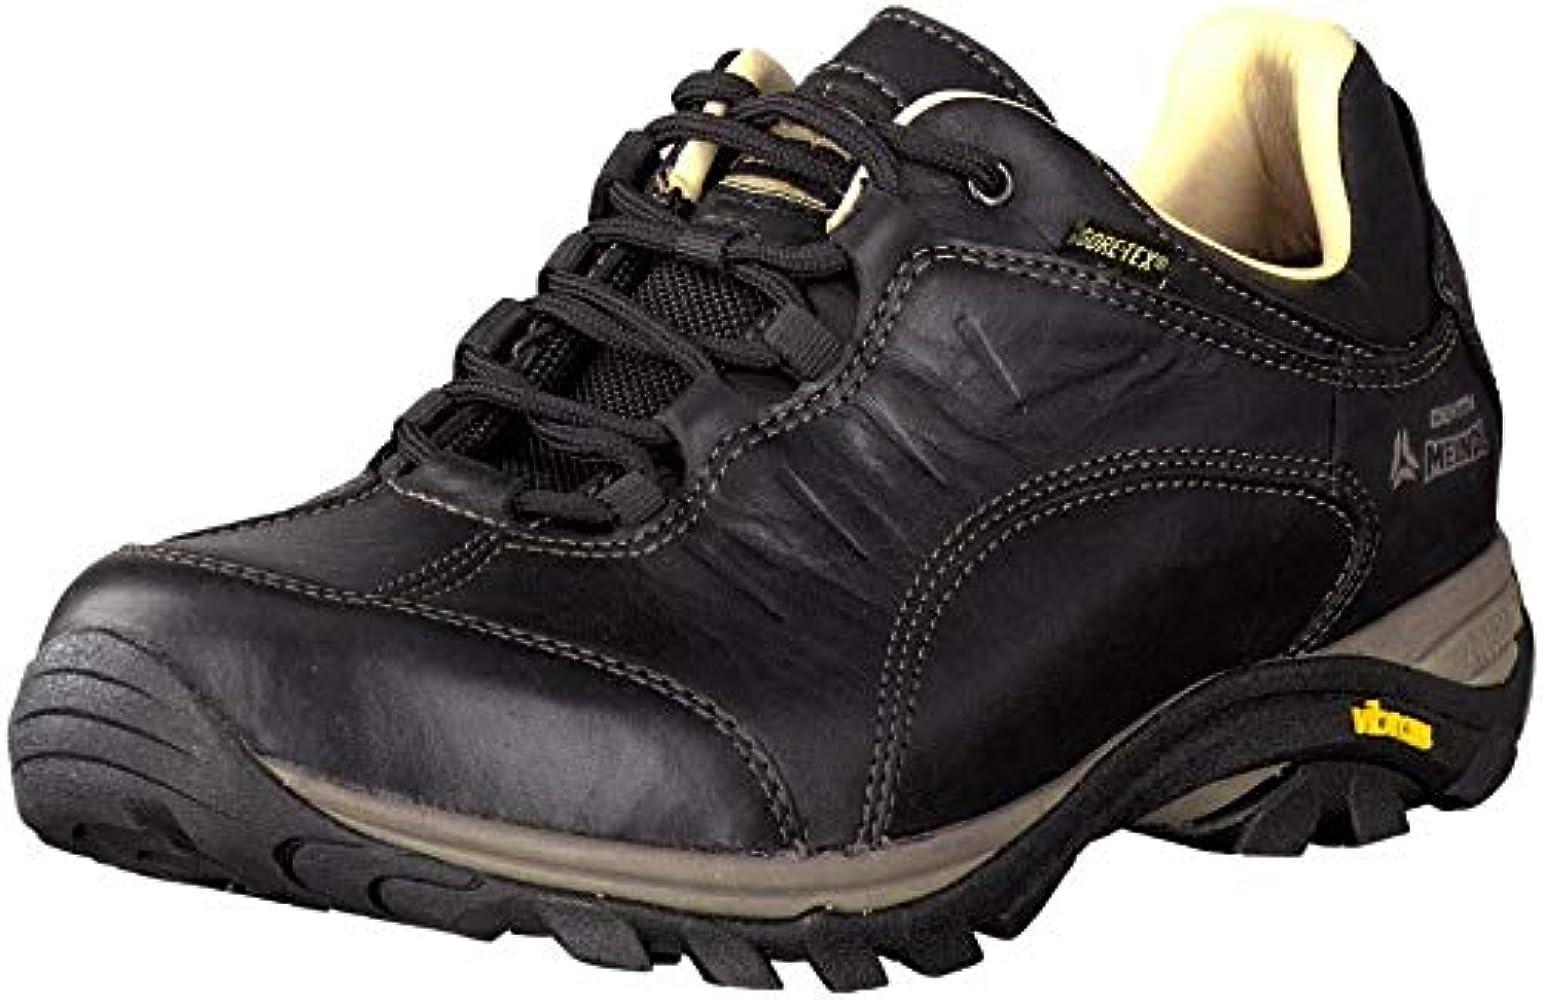 Meindl Schuhe Linosa Identity Men Dunkelbraun: